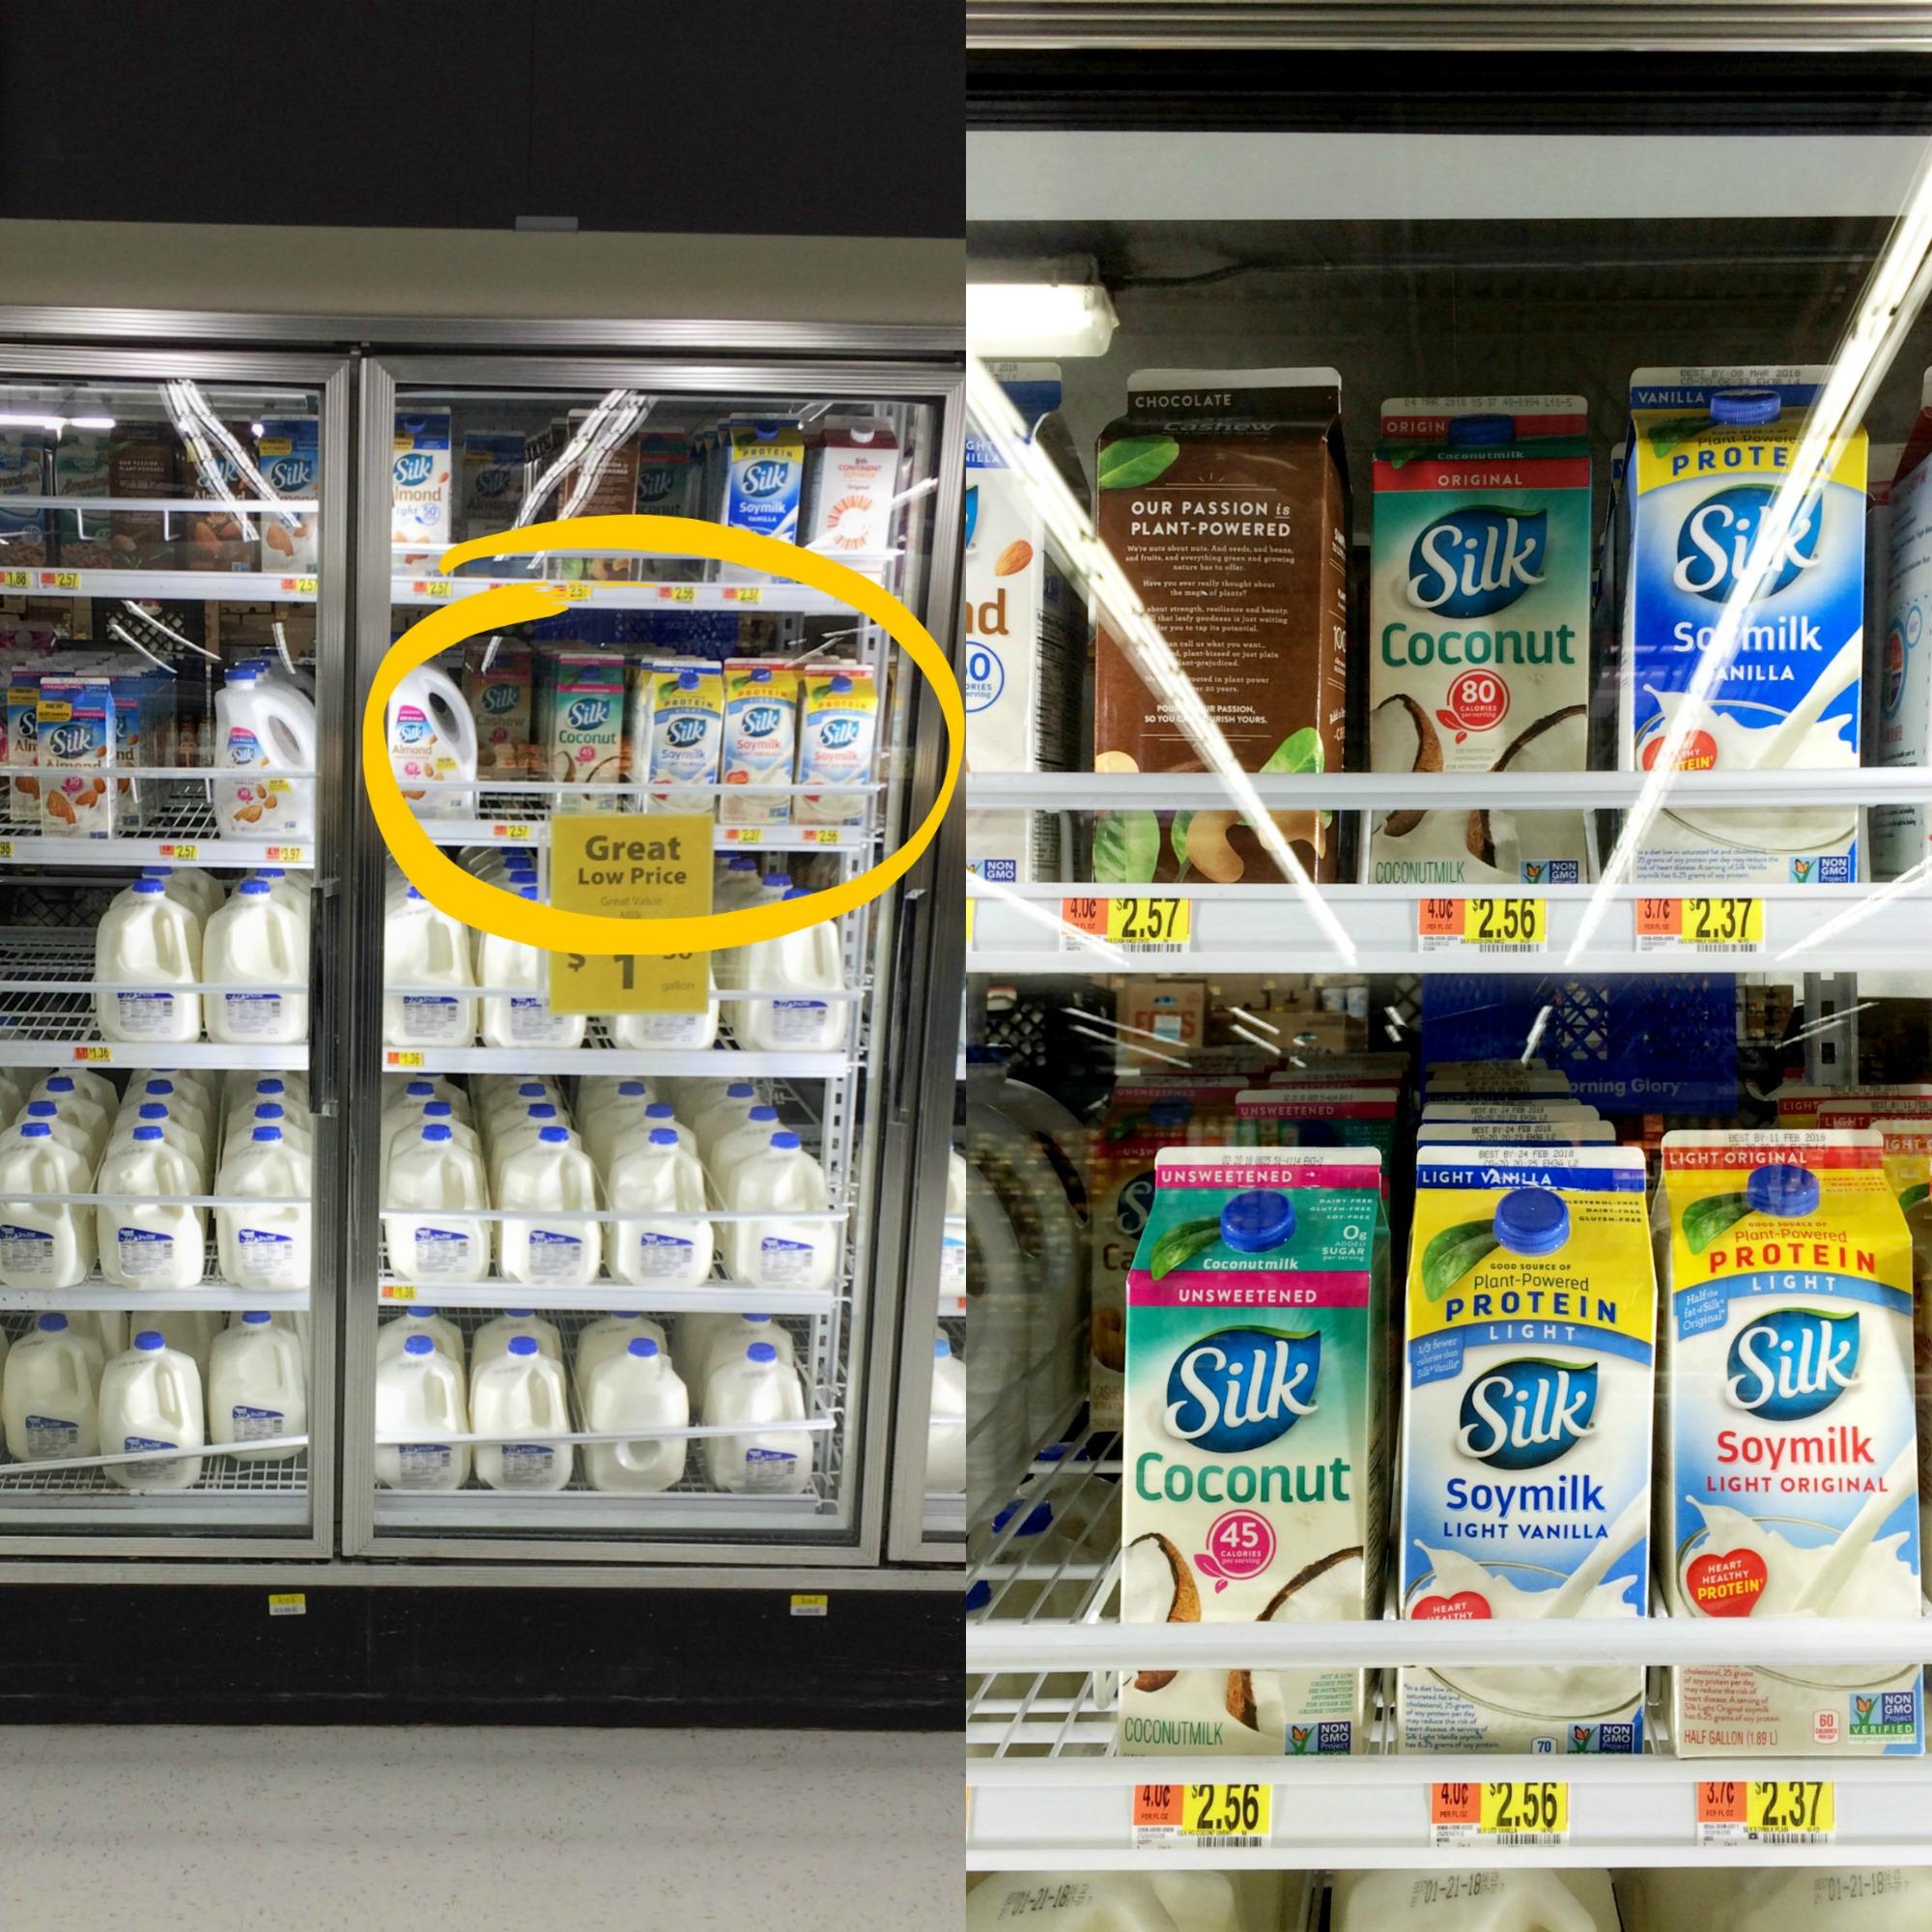 Silk milk half gallons at Walmart